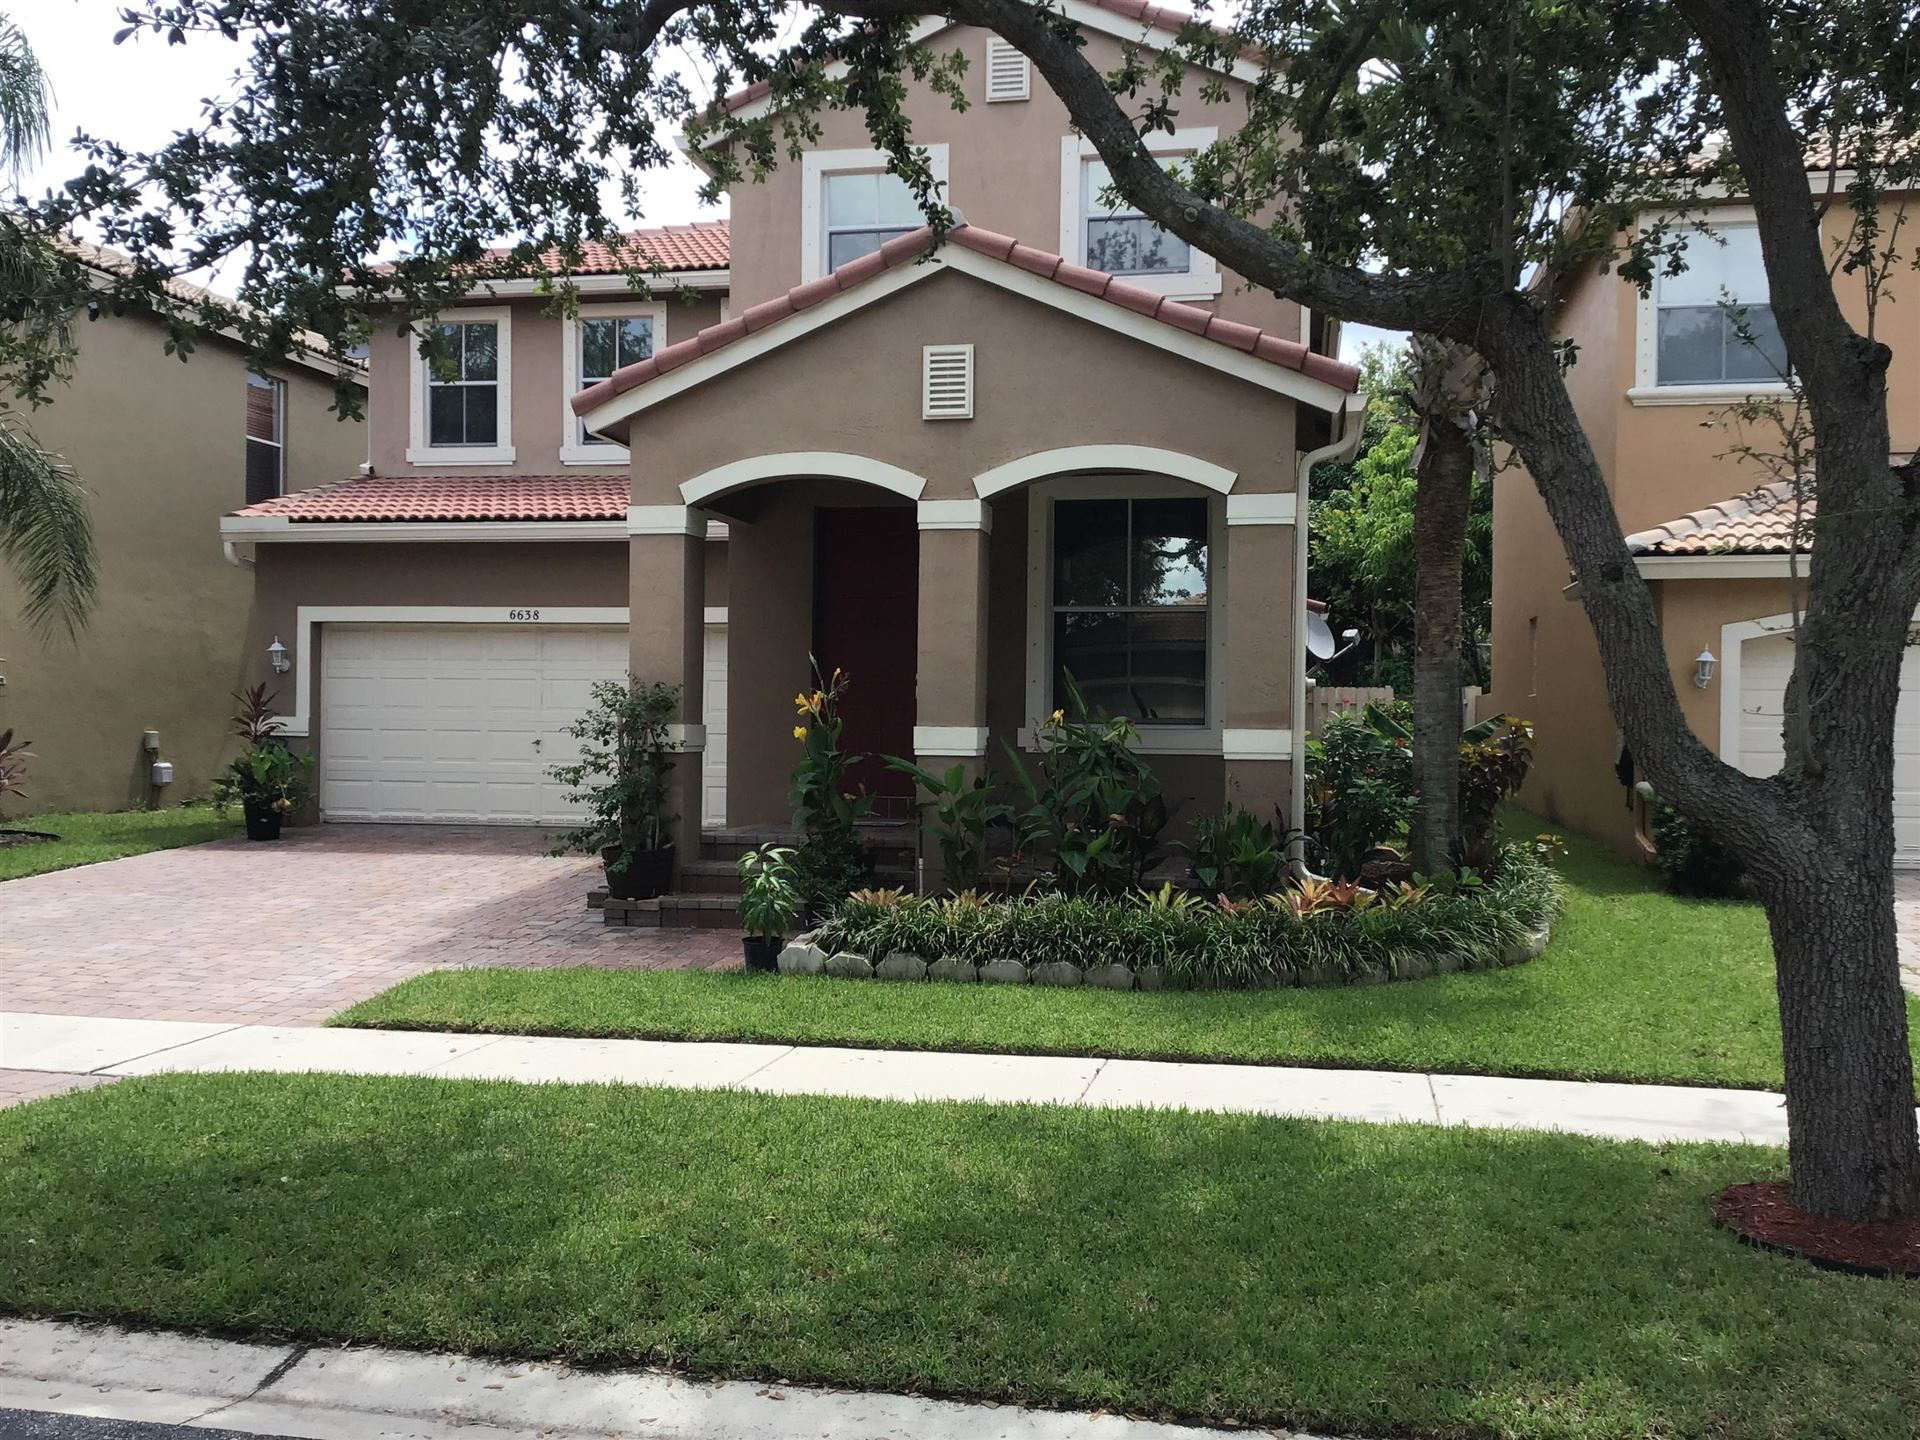 6638 Jacques Way, Lake Worth, FL 33463 - MLS#: RX-10736636